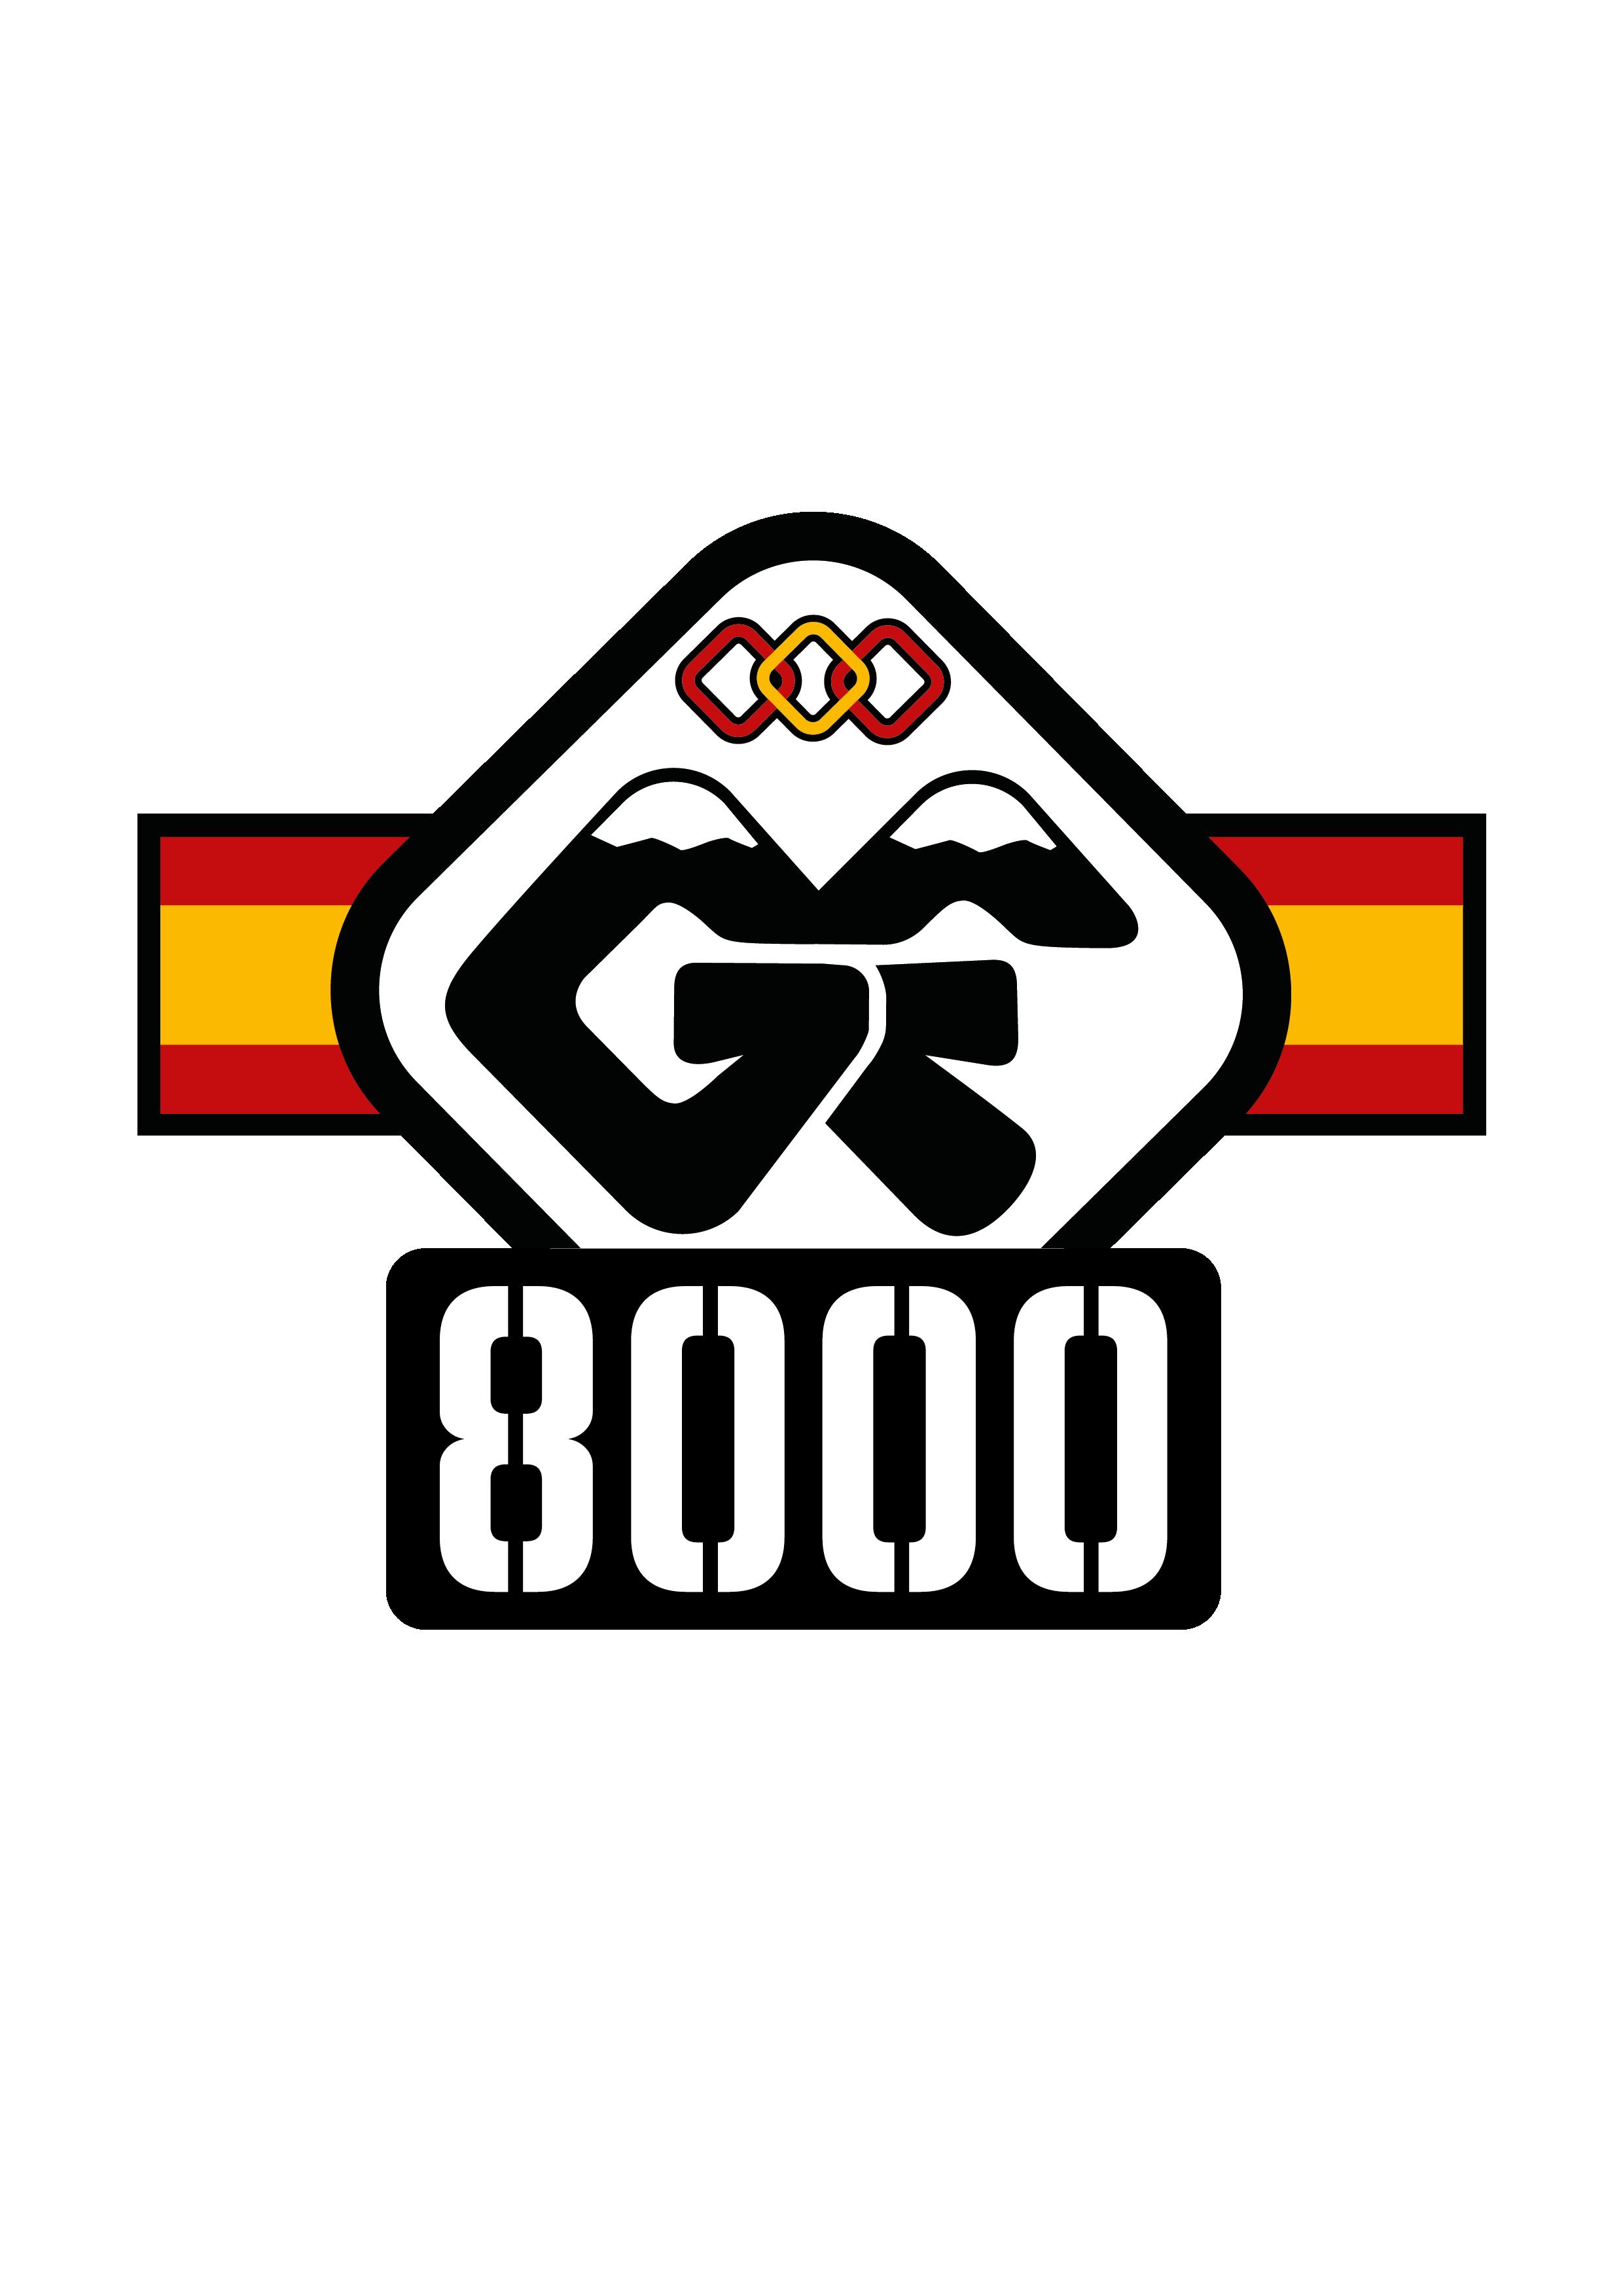 GF8000 SERIES